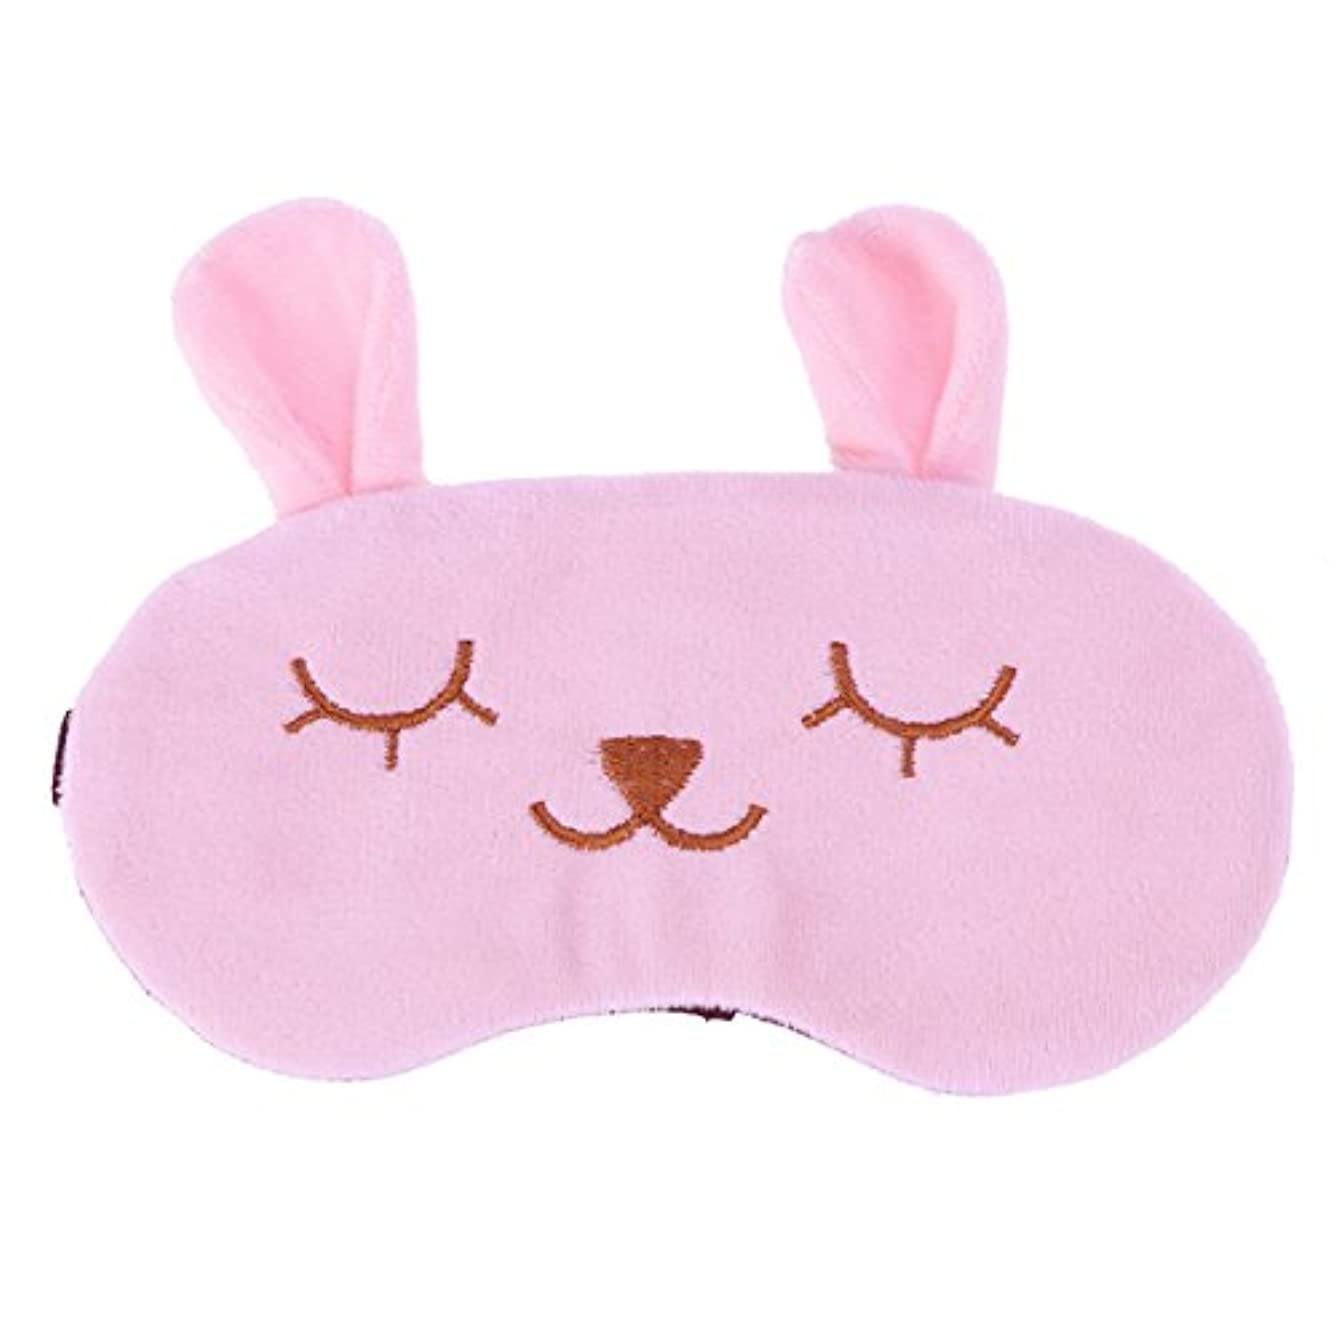 SUPVOX 昼寝瞑想のための豪華な睡眠のアイマスクかわいい冷却目隠しアイシェードポータブル